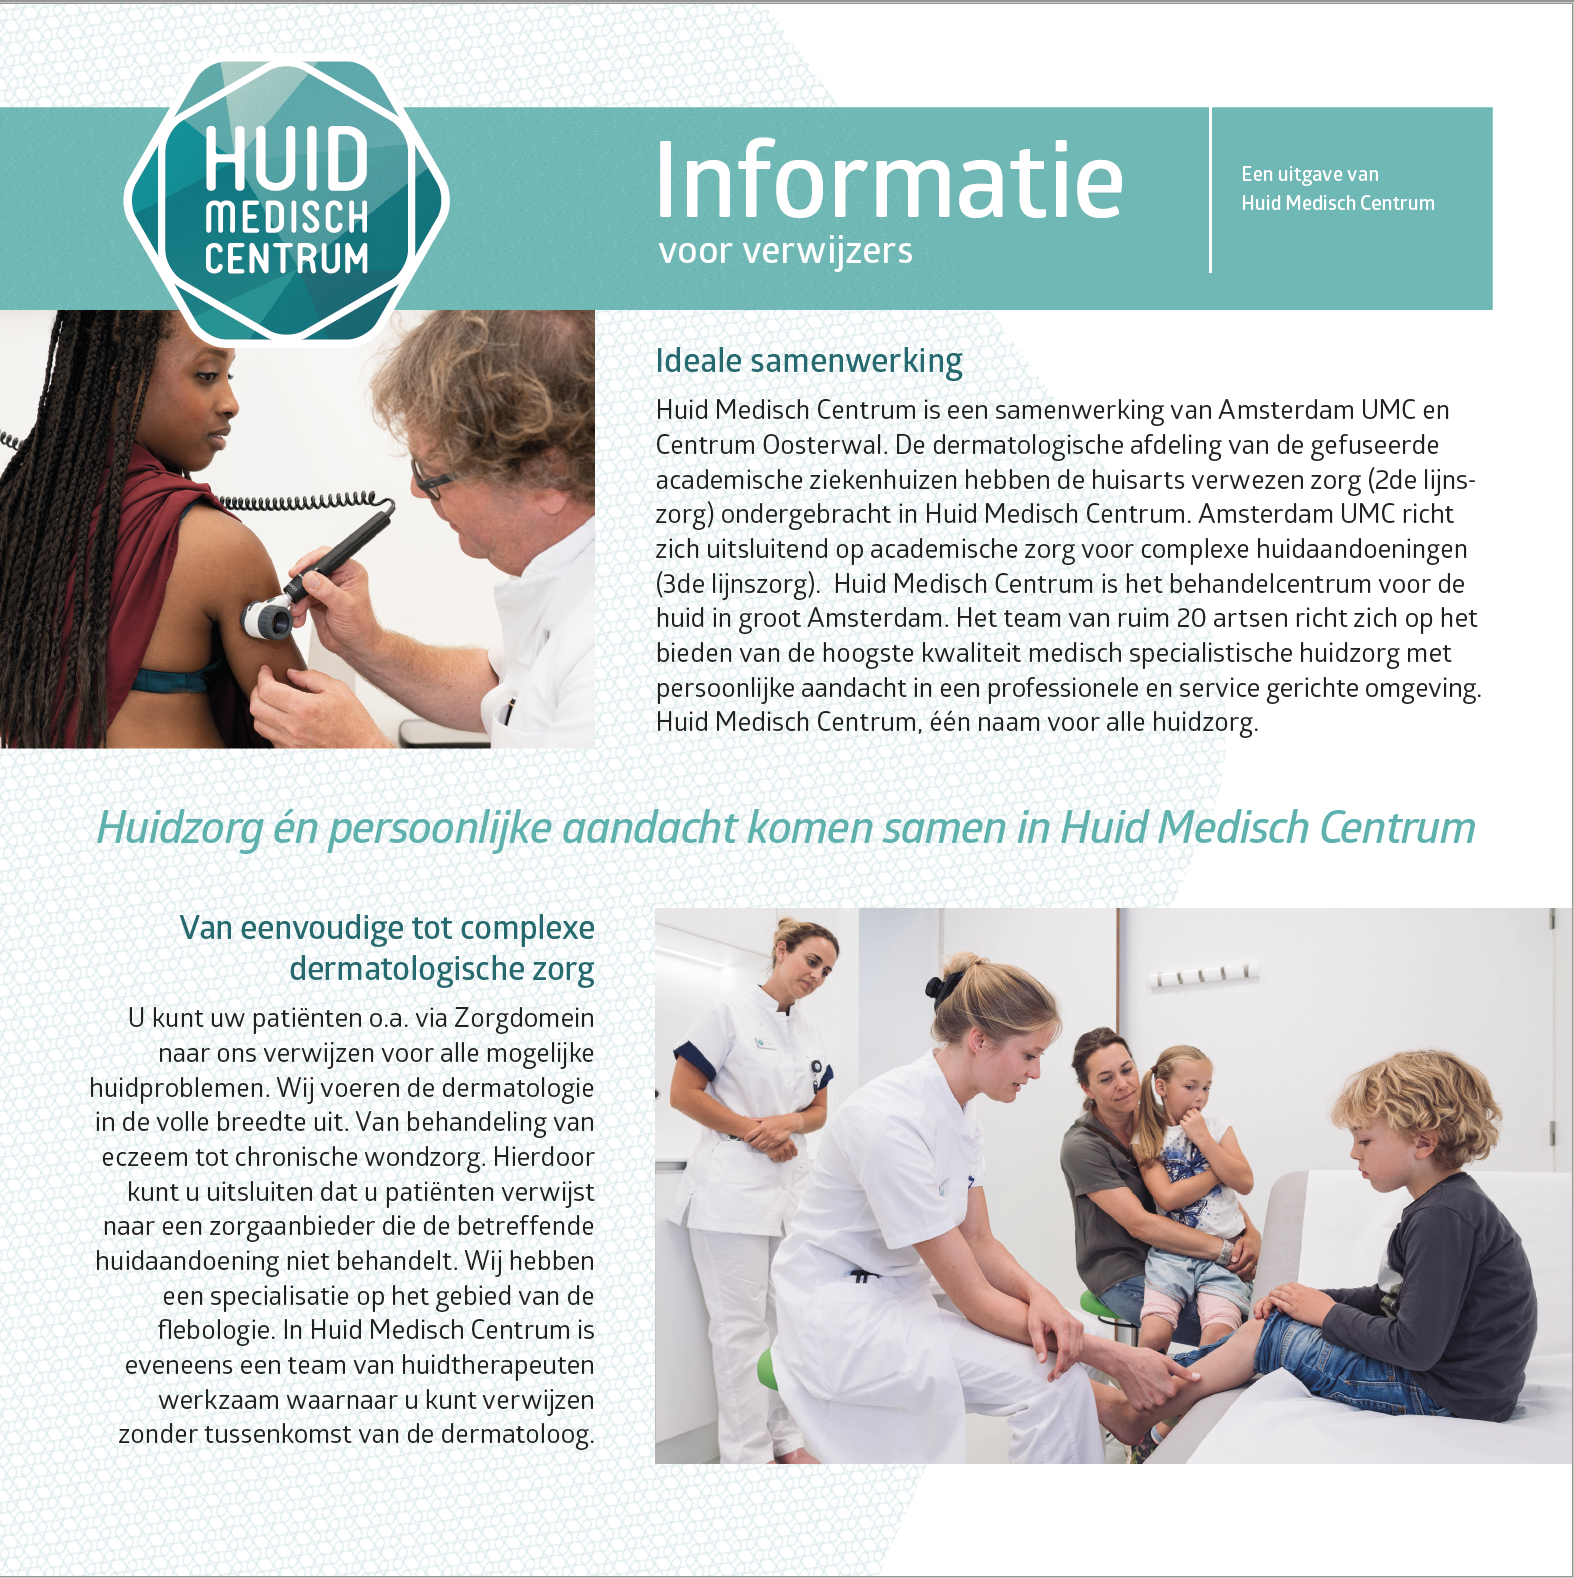 Huidmc_mailing